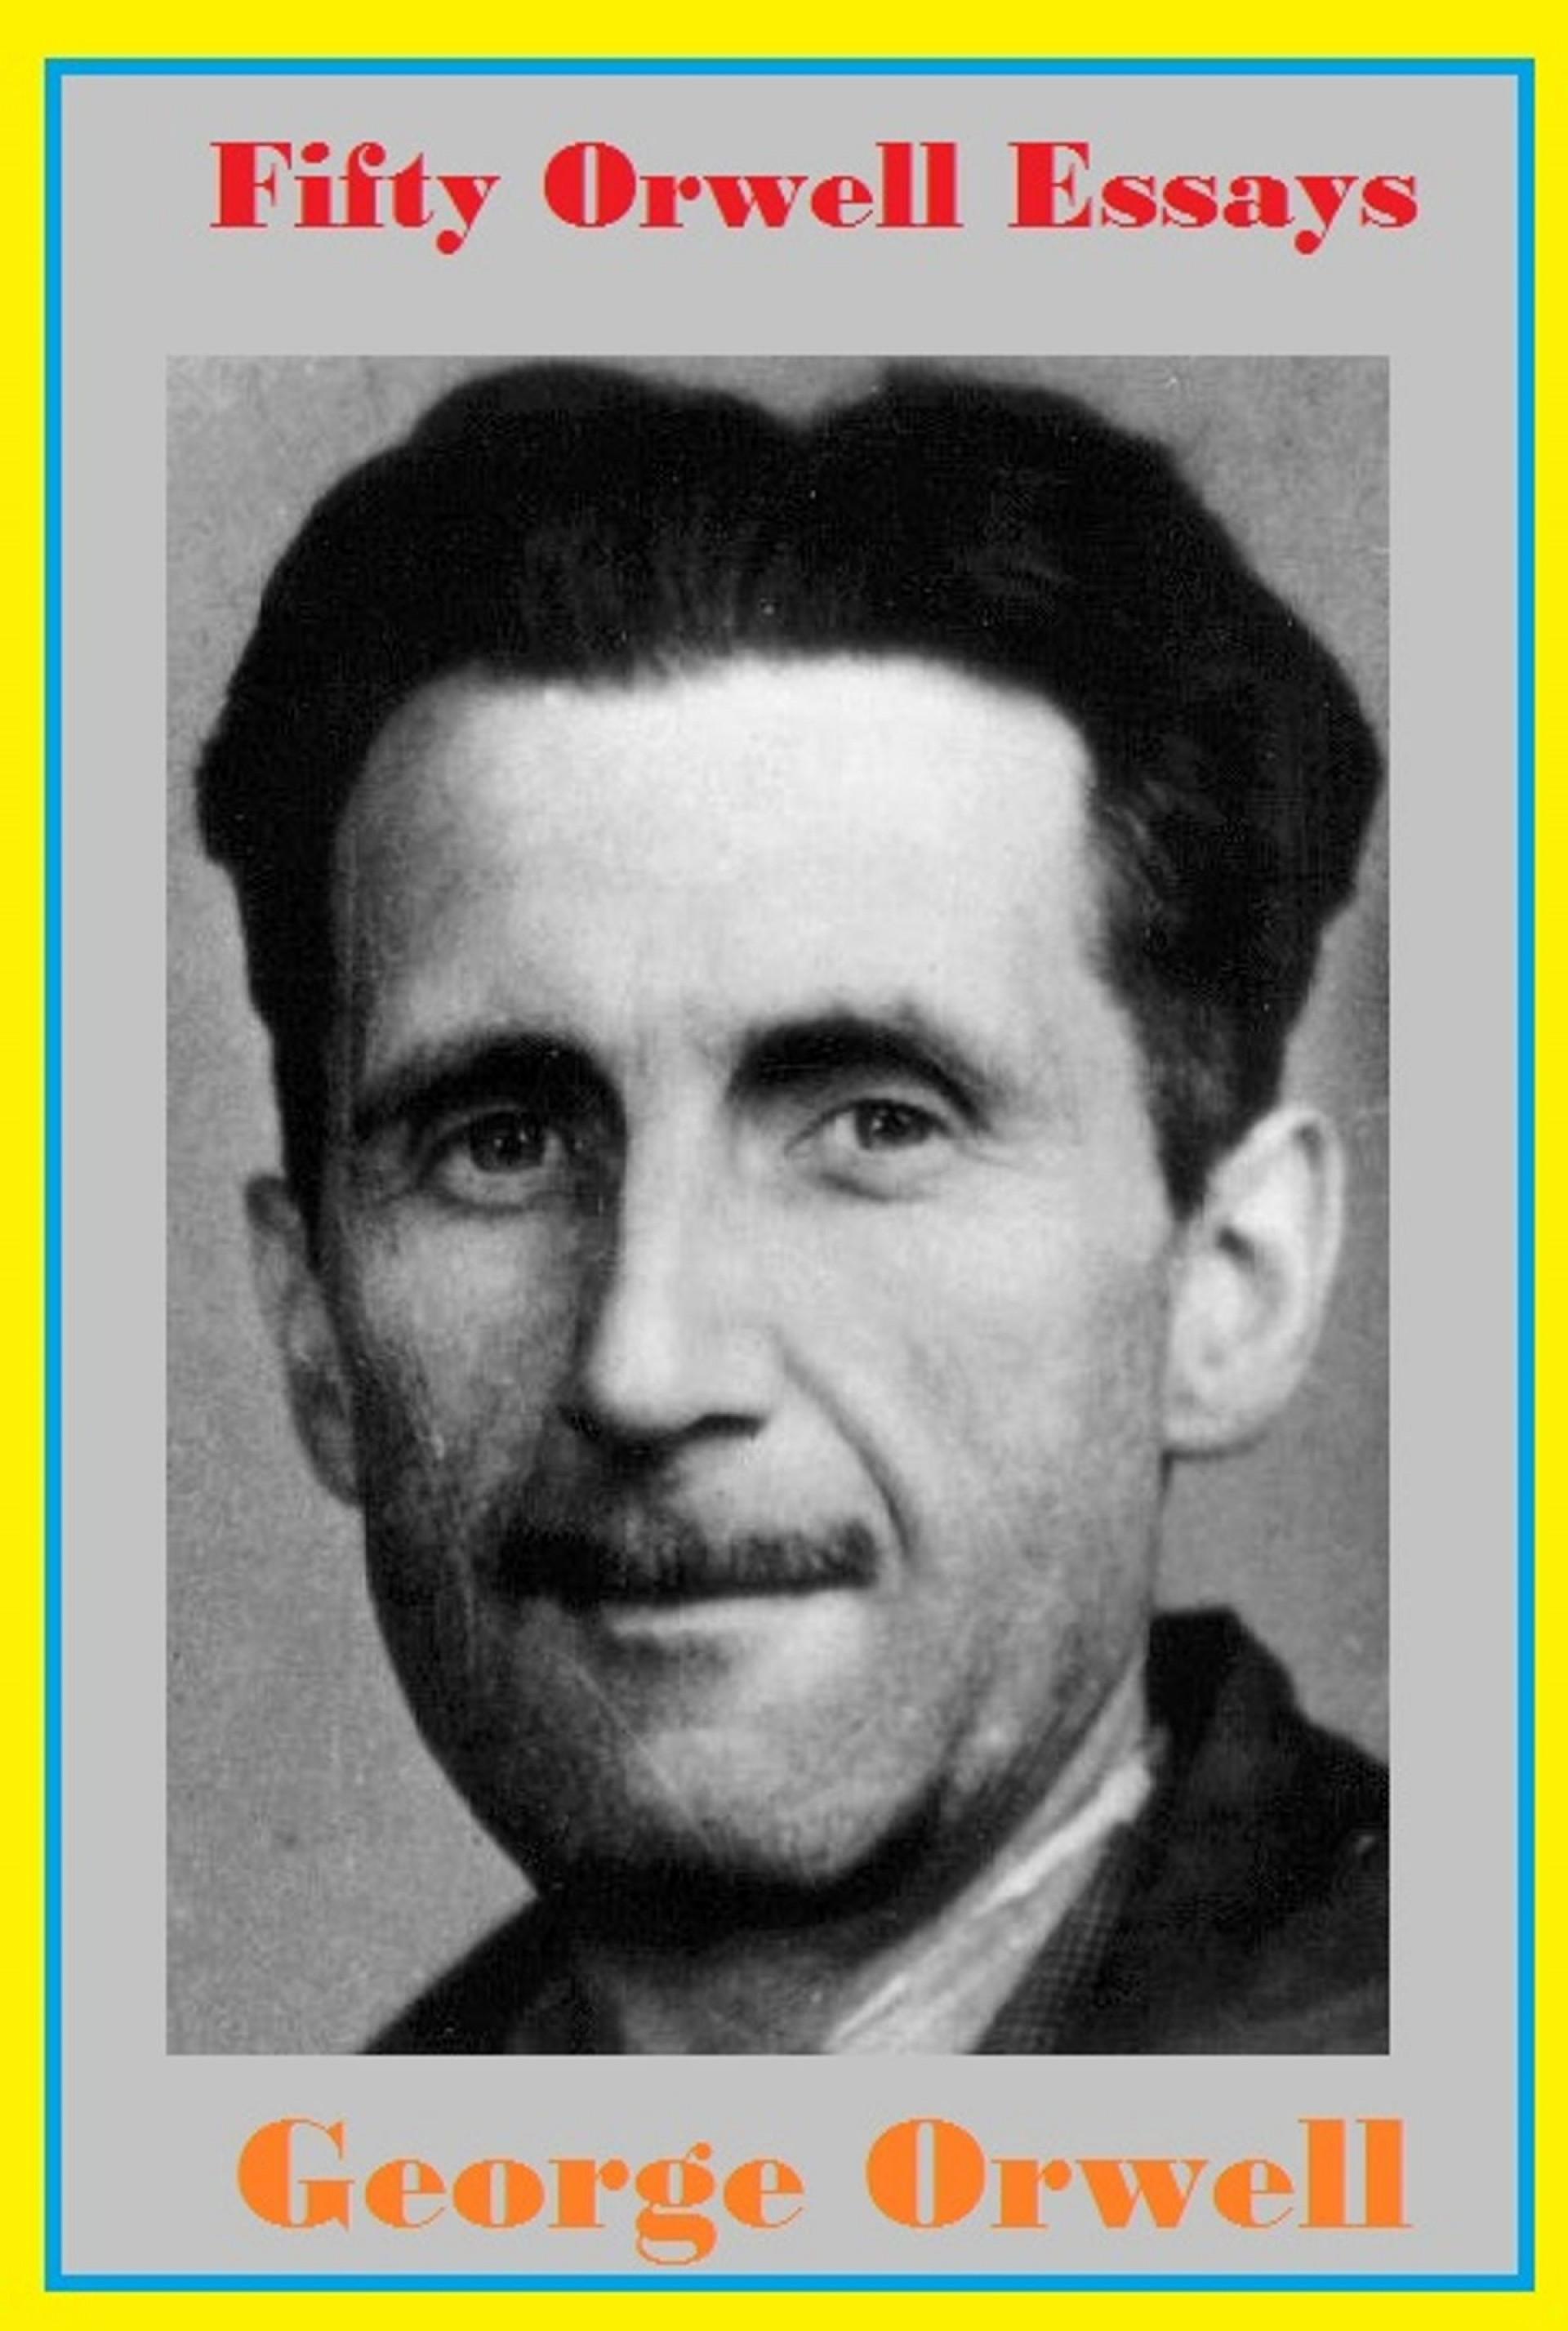 007 Essay Example Fifty Orwell Essays Frightening George Everyman's Library Summary Bookshop Memories 1920